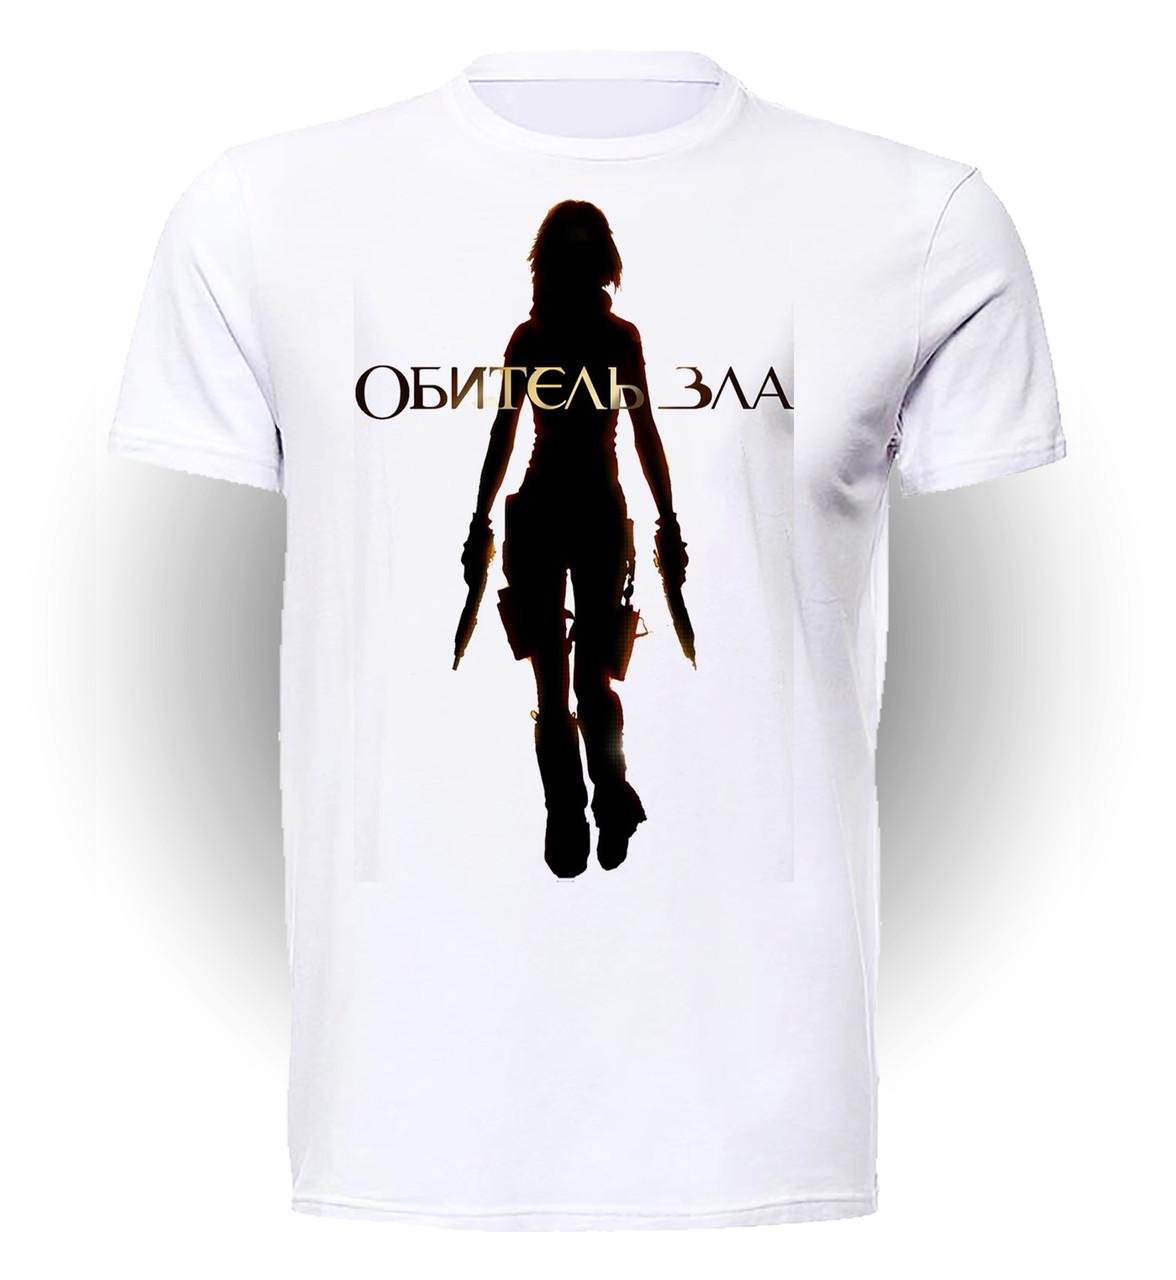 Футболка GeekLand Обитель Зла Resident Evil Extinction art RE.01.018